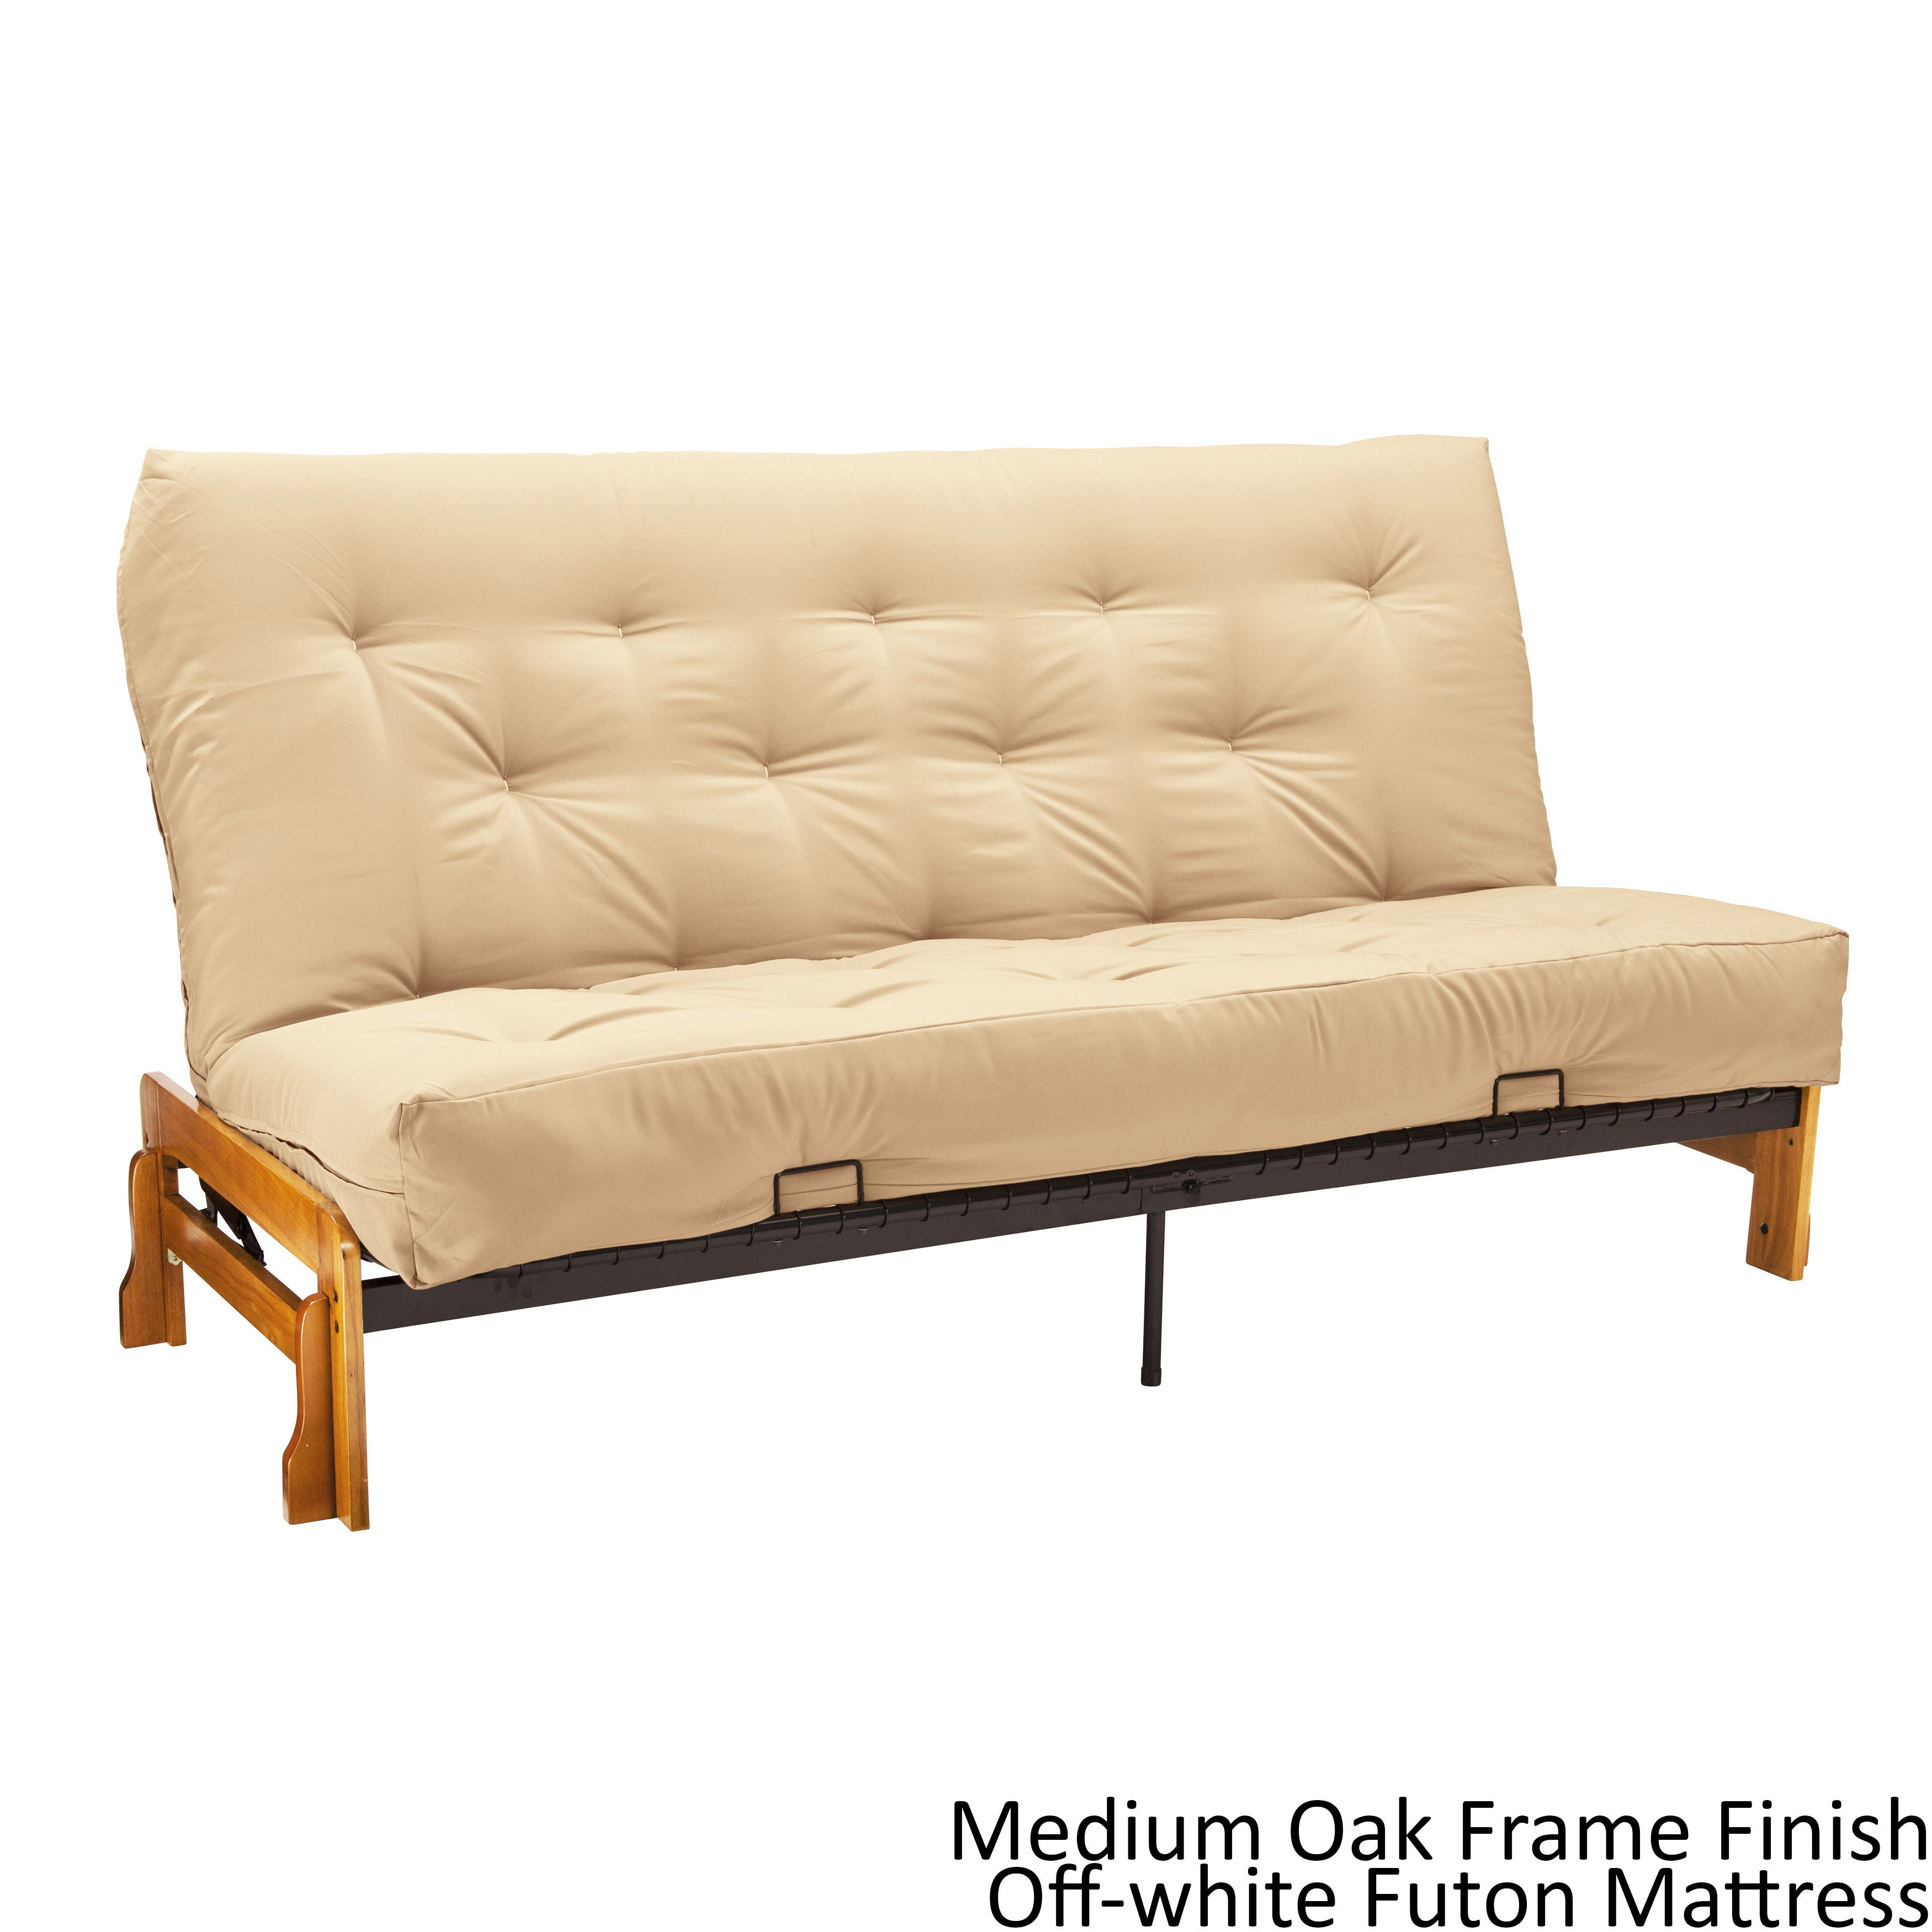 Boston Queen Armless Futon Frame Premier Mattress Set Sleeper Bed